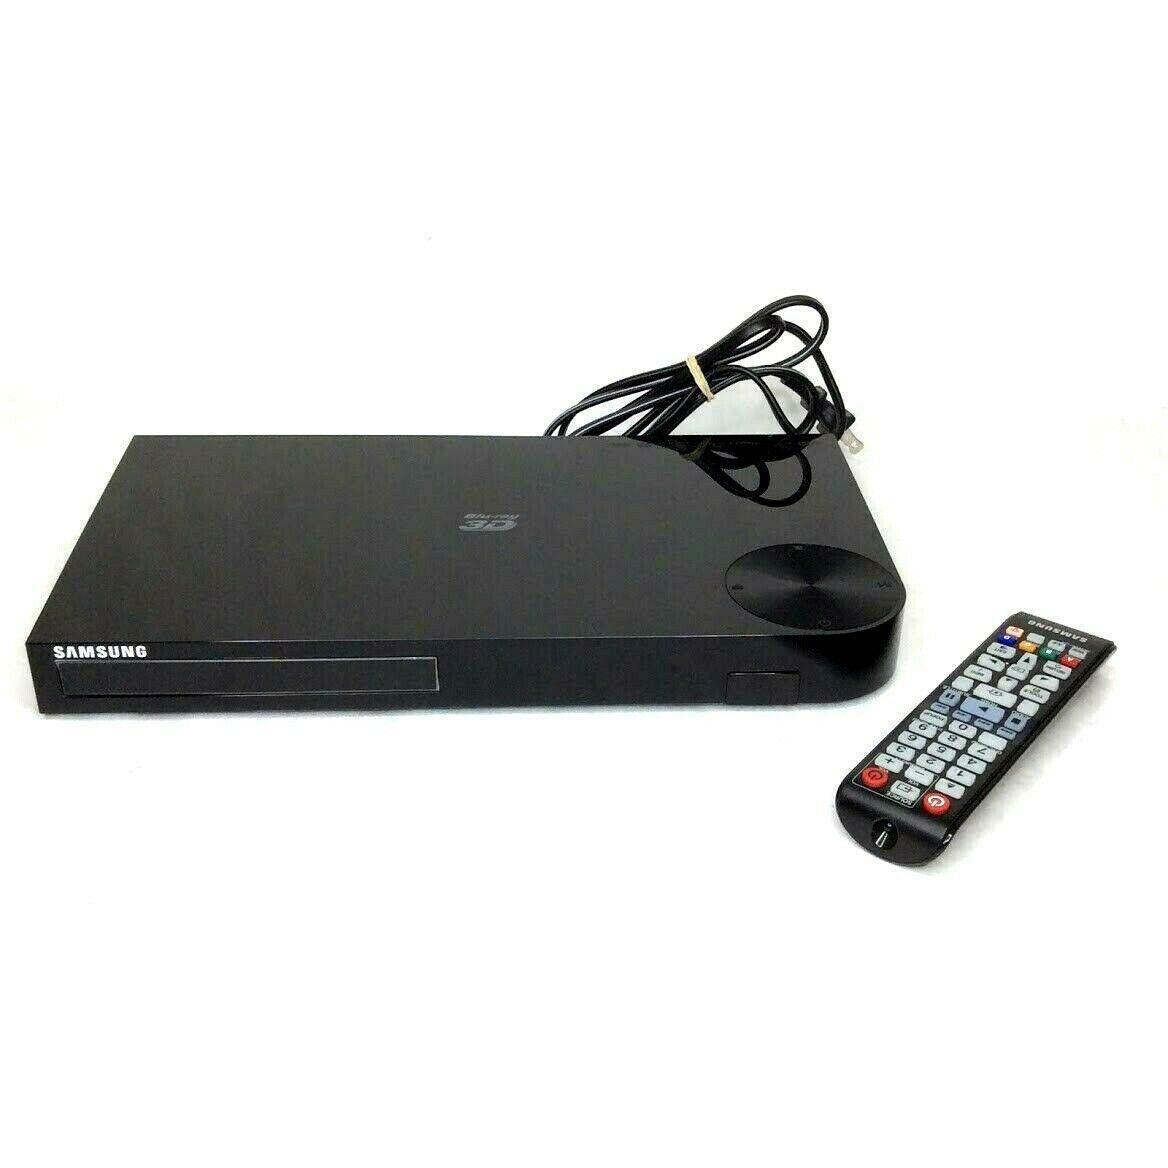 SAMSUNG BD-H6500 3D Smart Wi-Fi Blu-ray DVD Player Wireless Internet Streaming - $65.42